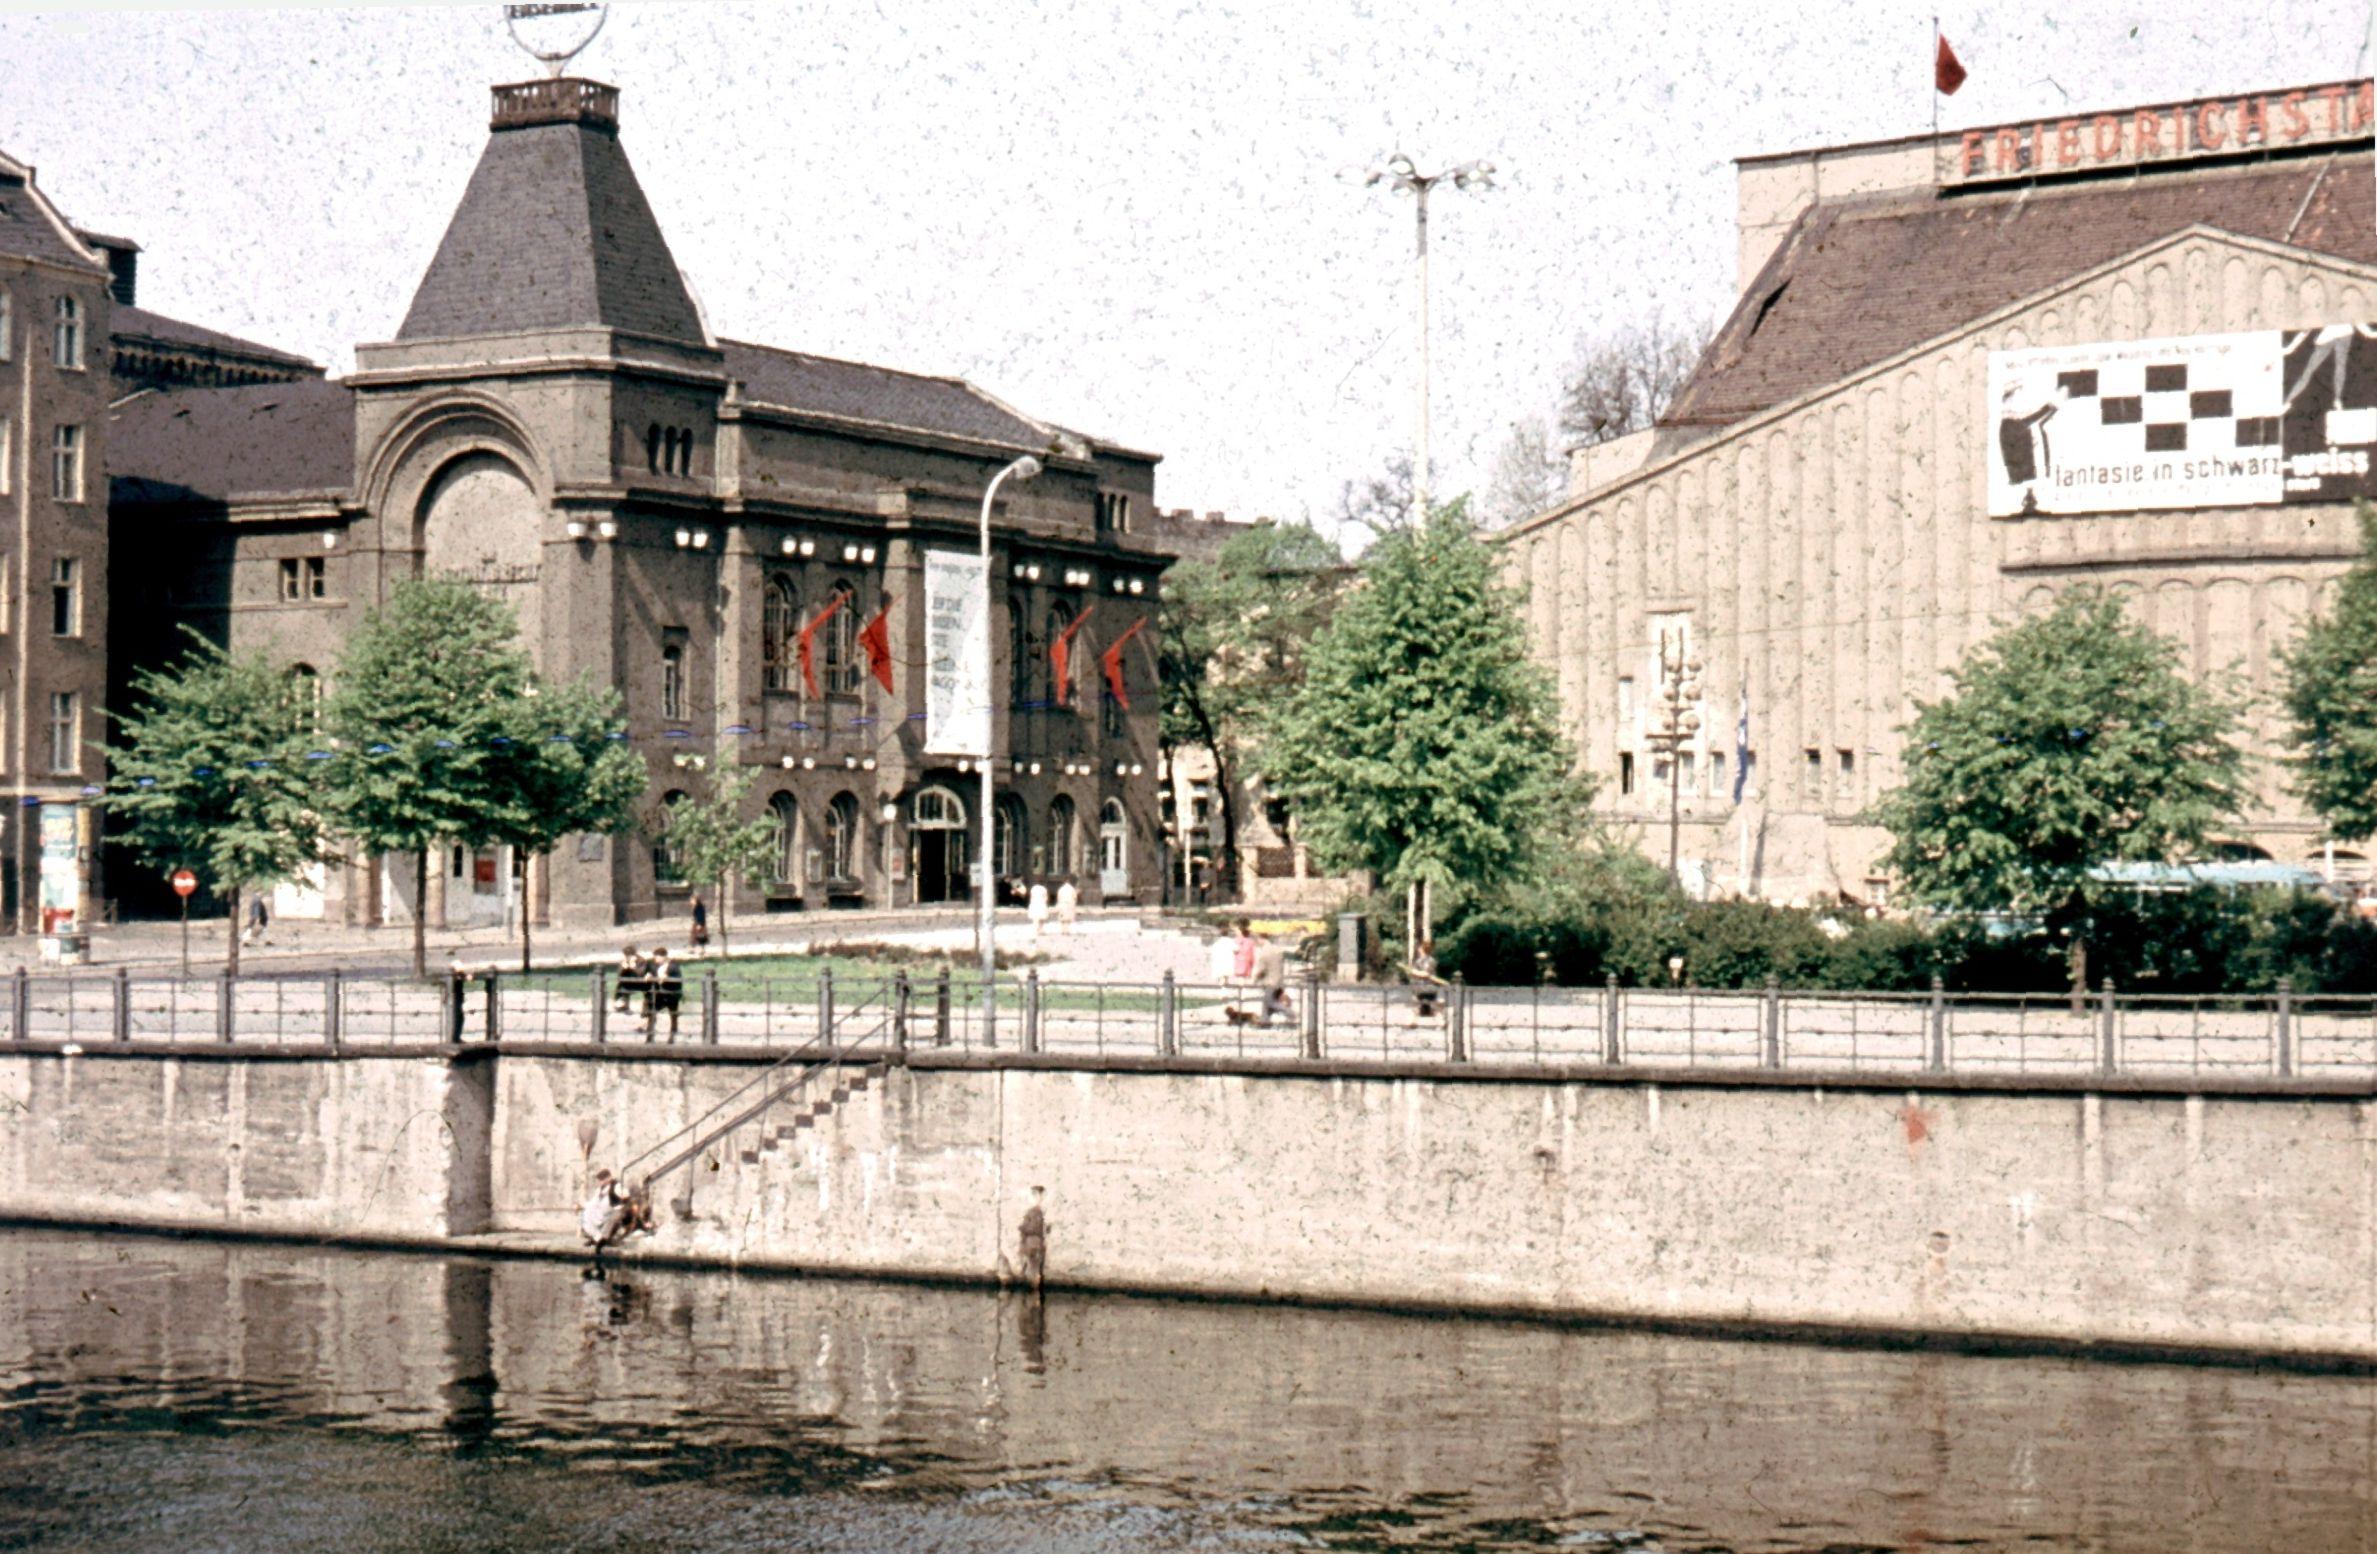 Der Friedrichstadtpalast, (Großes Schauspielhaus, rechts im Bild)), links das Berliner Ensemble, 1964